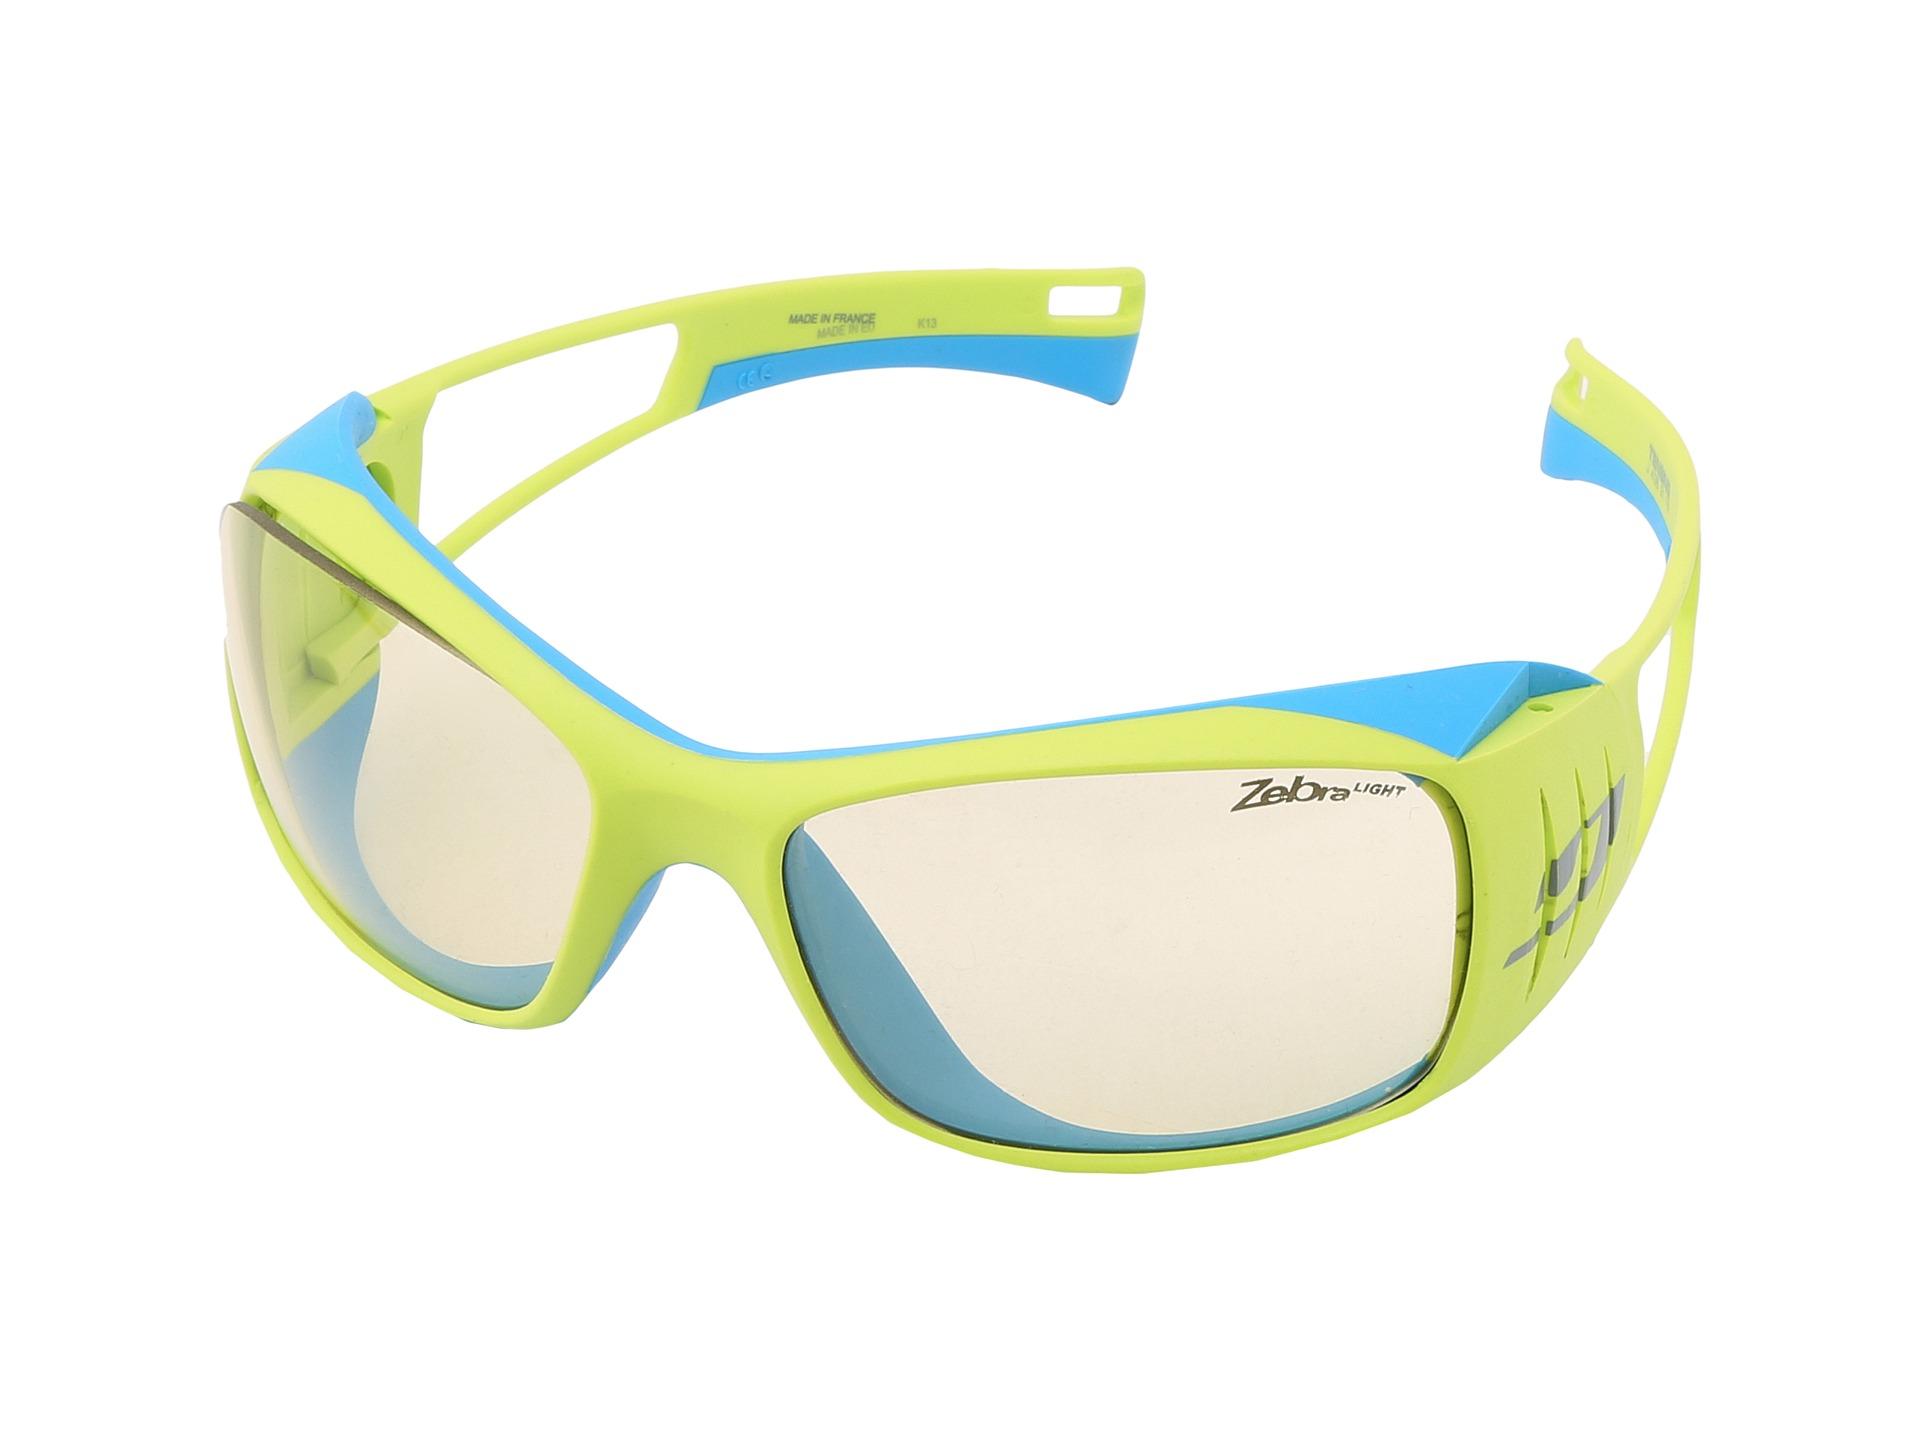 Polarized Interchangeable Sunglasses www.panaust.com.au